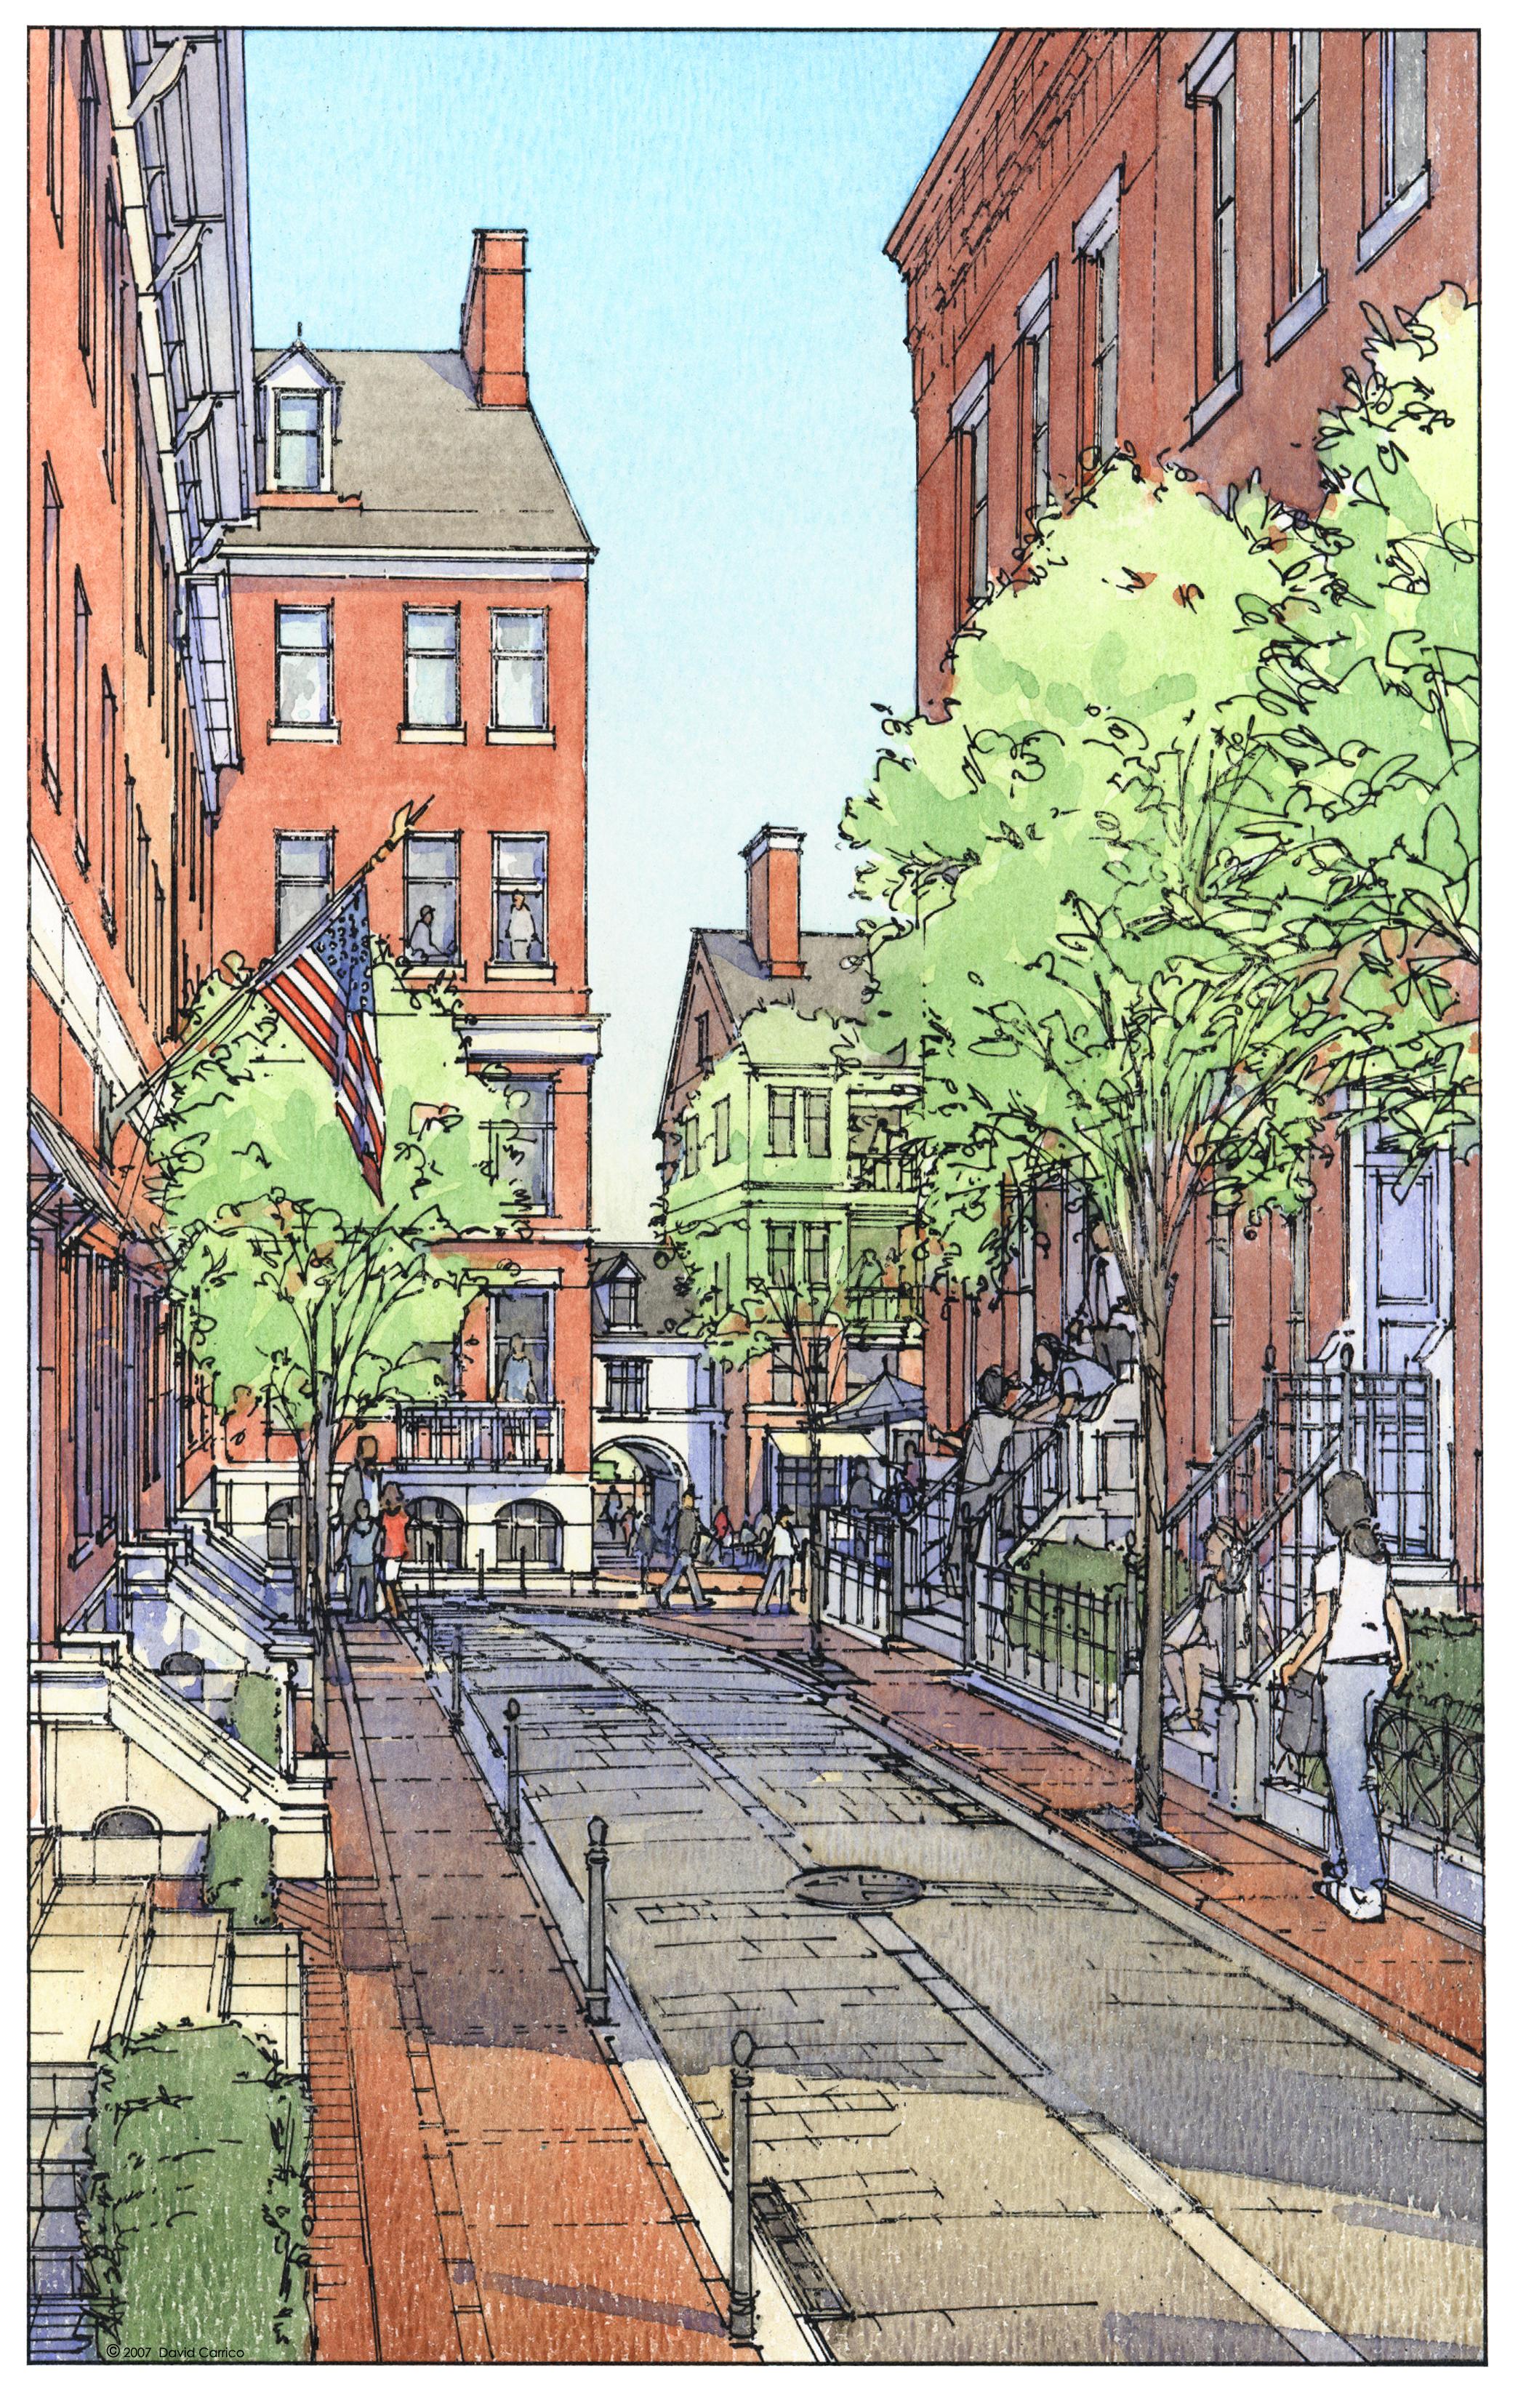 Portland.ME.Robert_Orr_&_Assoc.Cotton_Street.Mixed-Use_Development.Skinny_Street.jpg